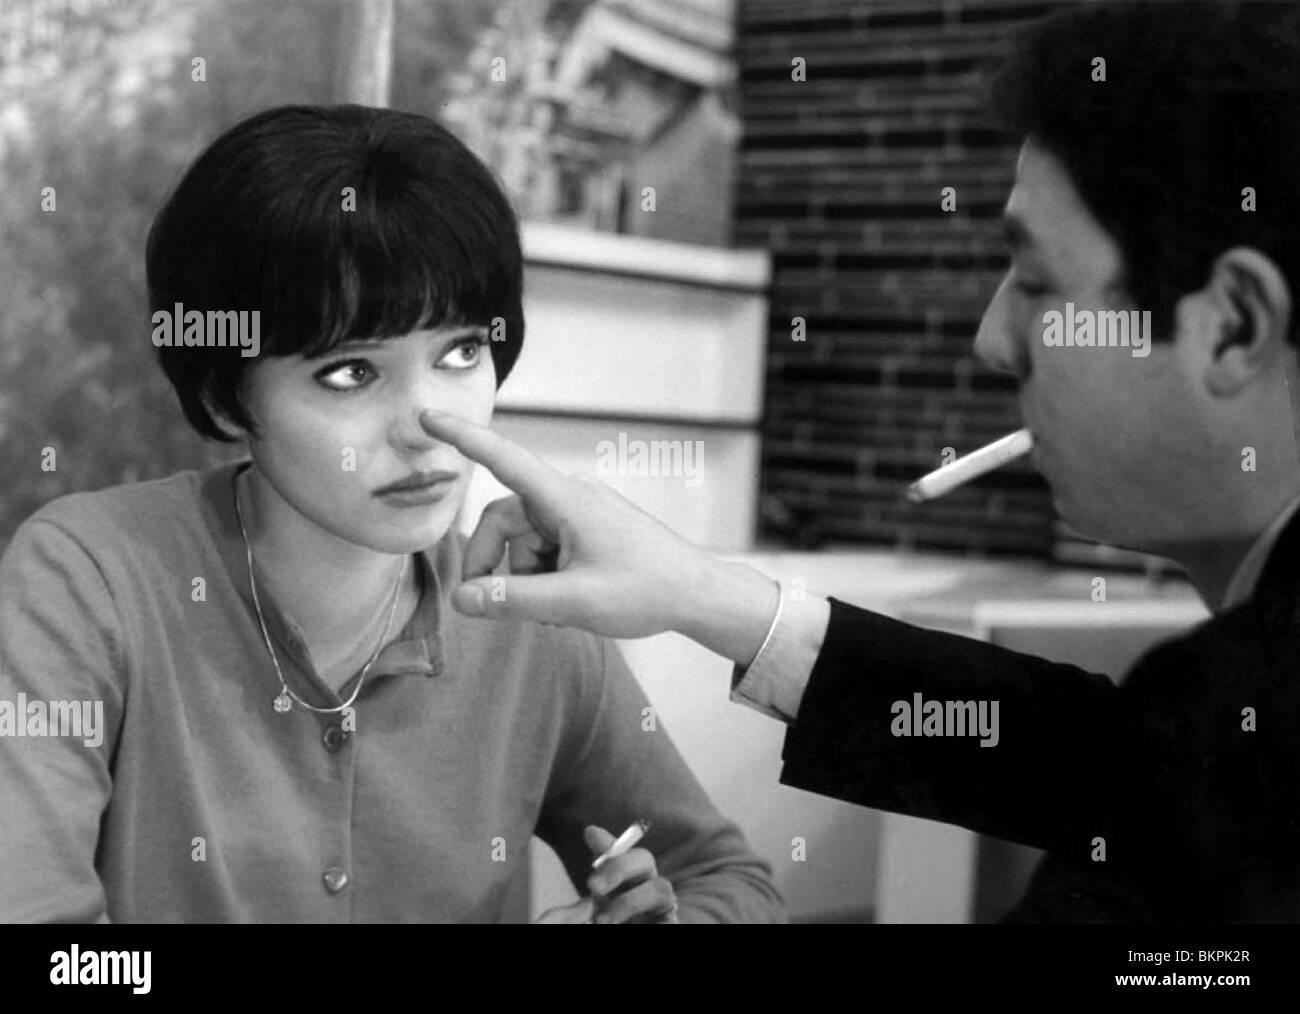 VIVRE SA VIE (1962) IT'S MY LIFE (ALT) MY LIFE TO LIVE (ALT) ANNA KARINA JEAN-LUC GODARD (DIR) VIVR 002 Stock Photo